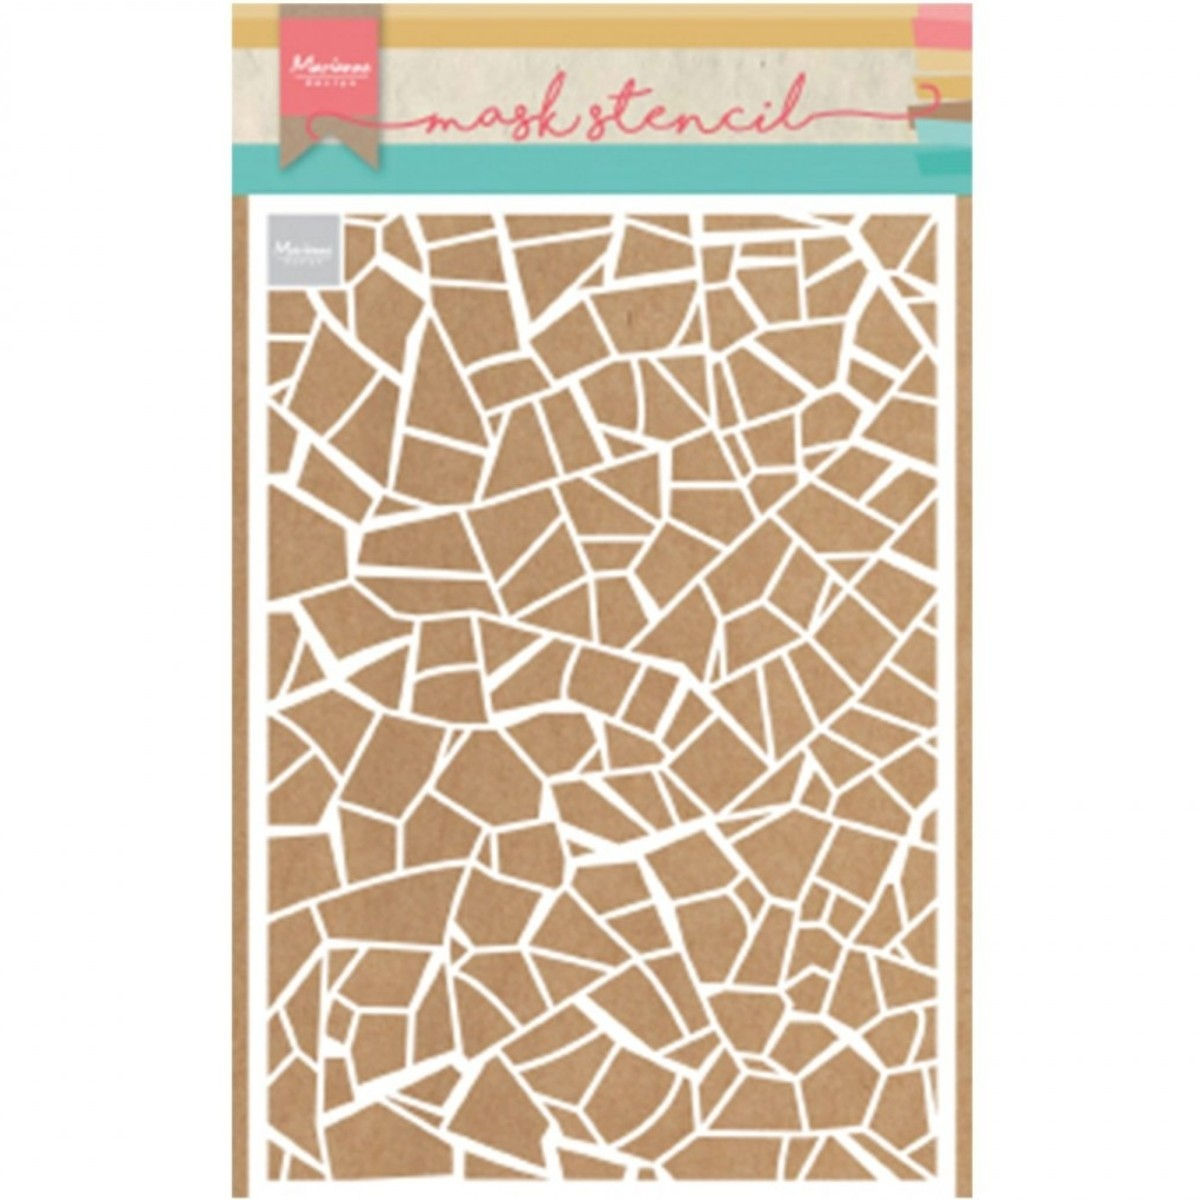 Stencil, 15 x 21, Broken tiles